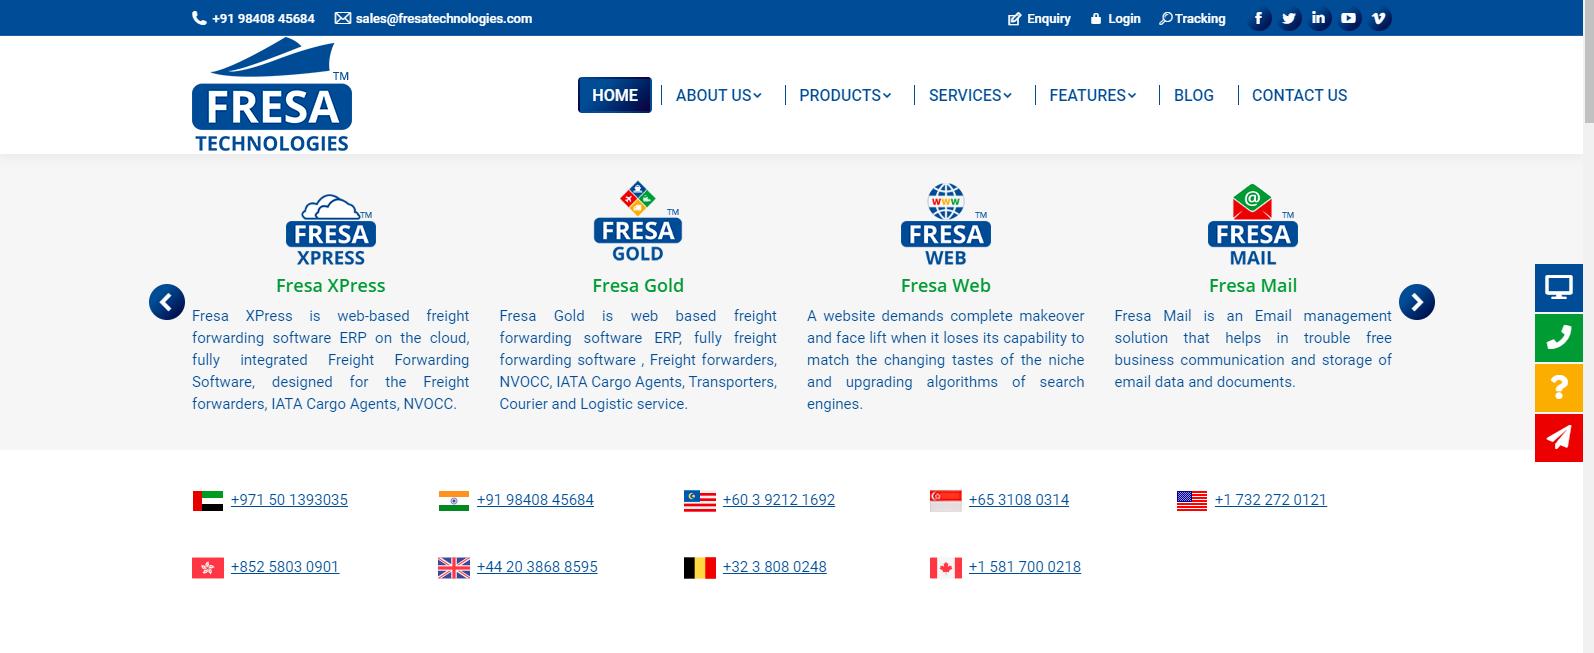 fresa technologies.com